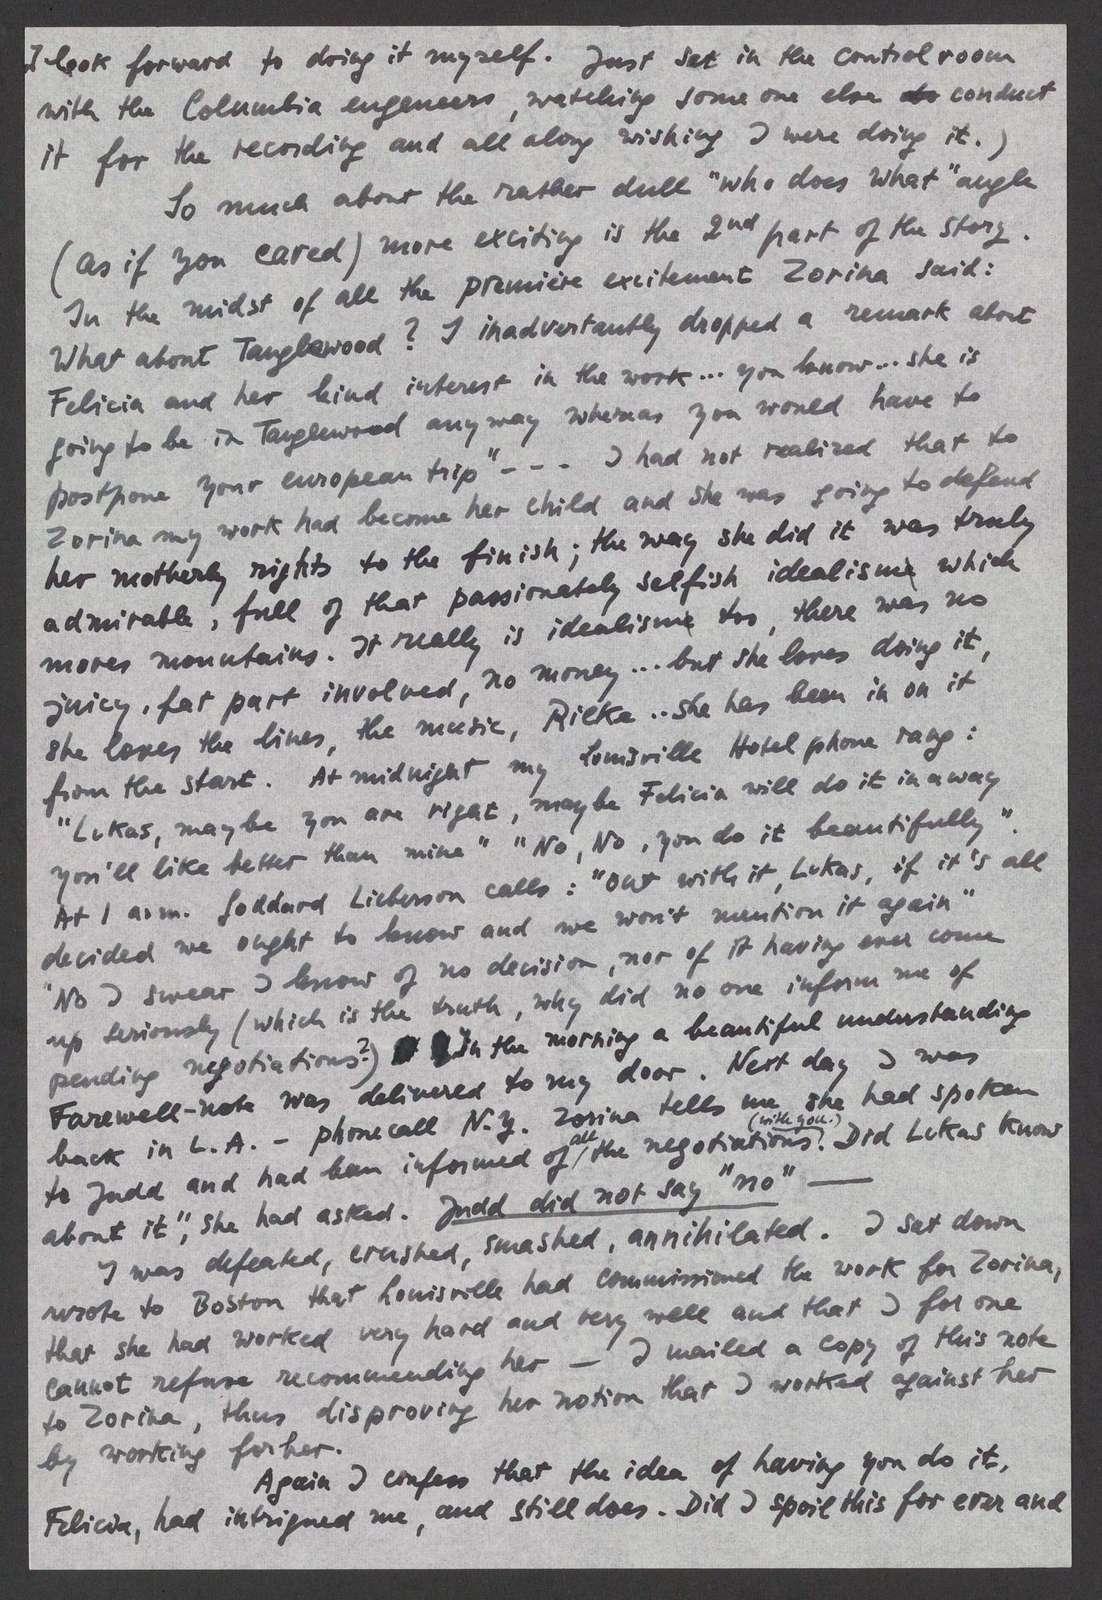 Lukas Foss to Leonard and Felicia Bernstein, March 29, 195?